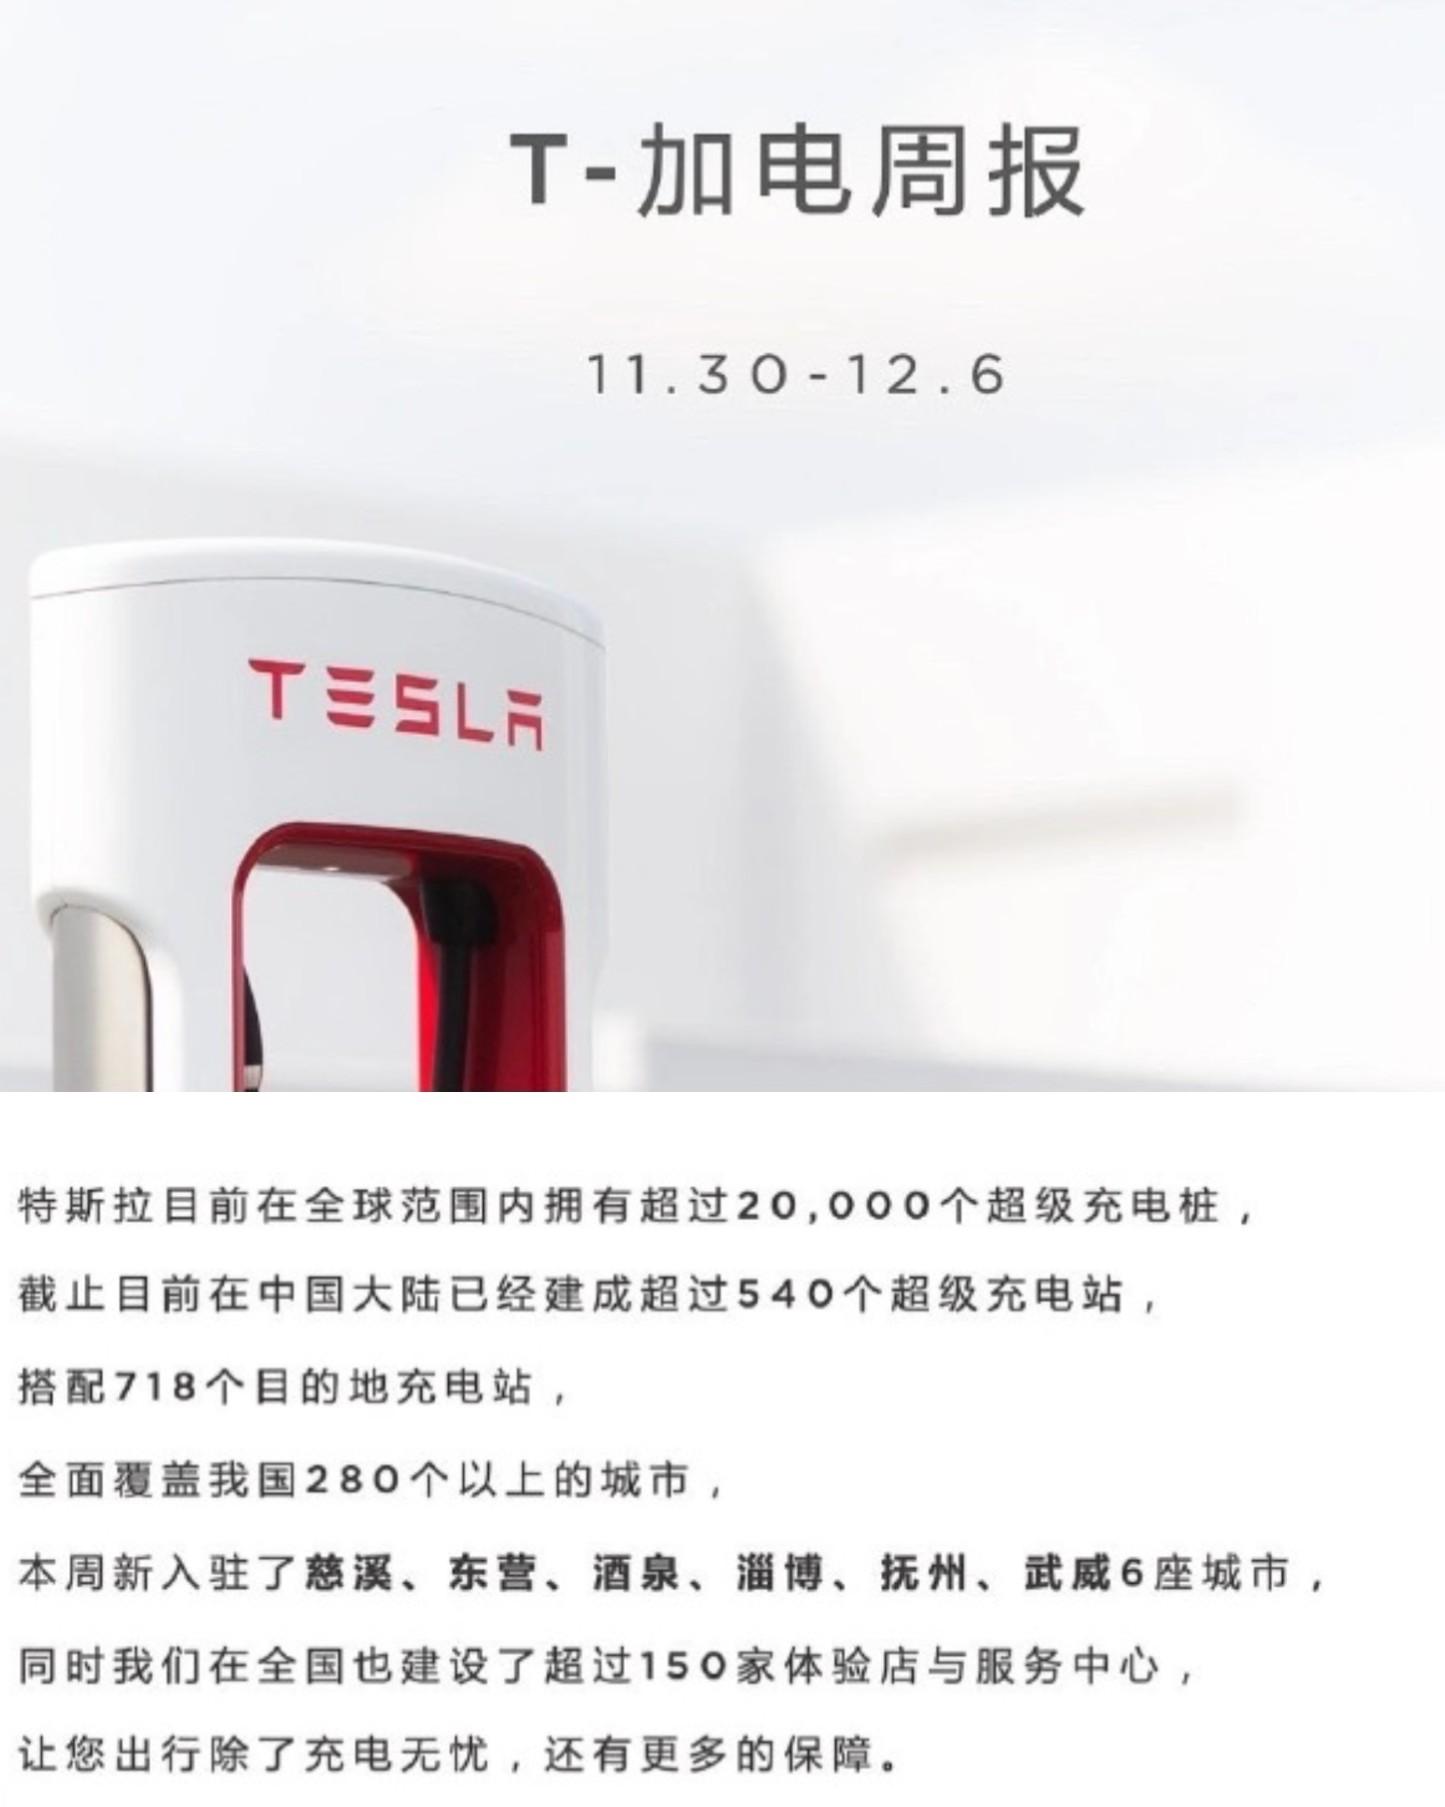 telsa-china-infrastructure-supercharger-v3-sales-service-center